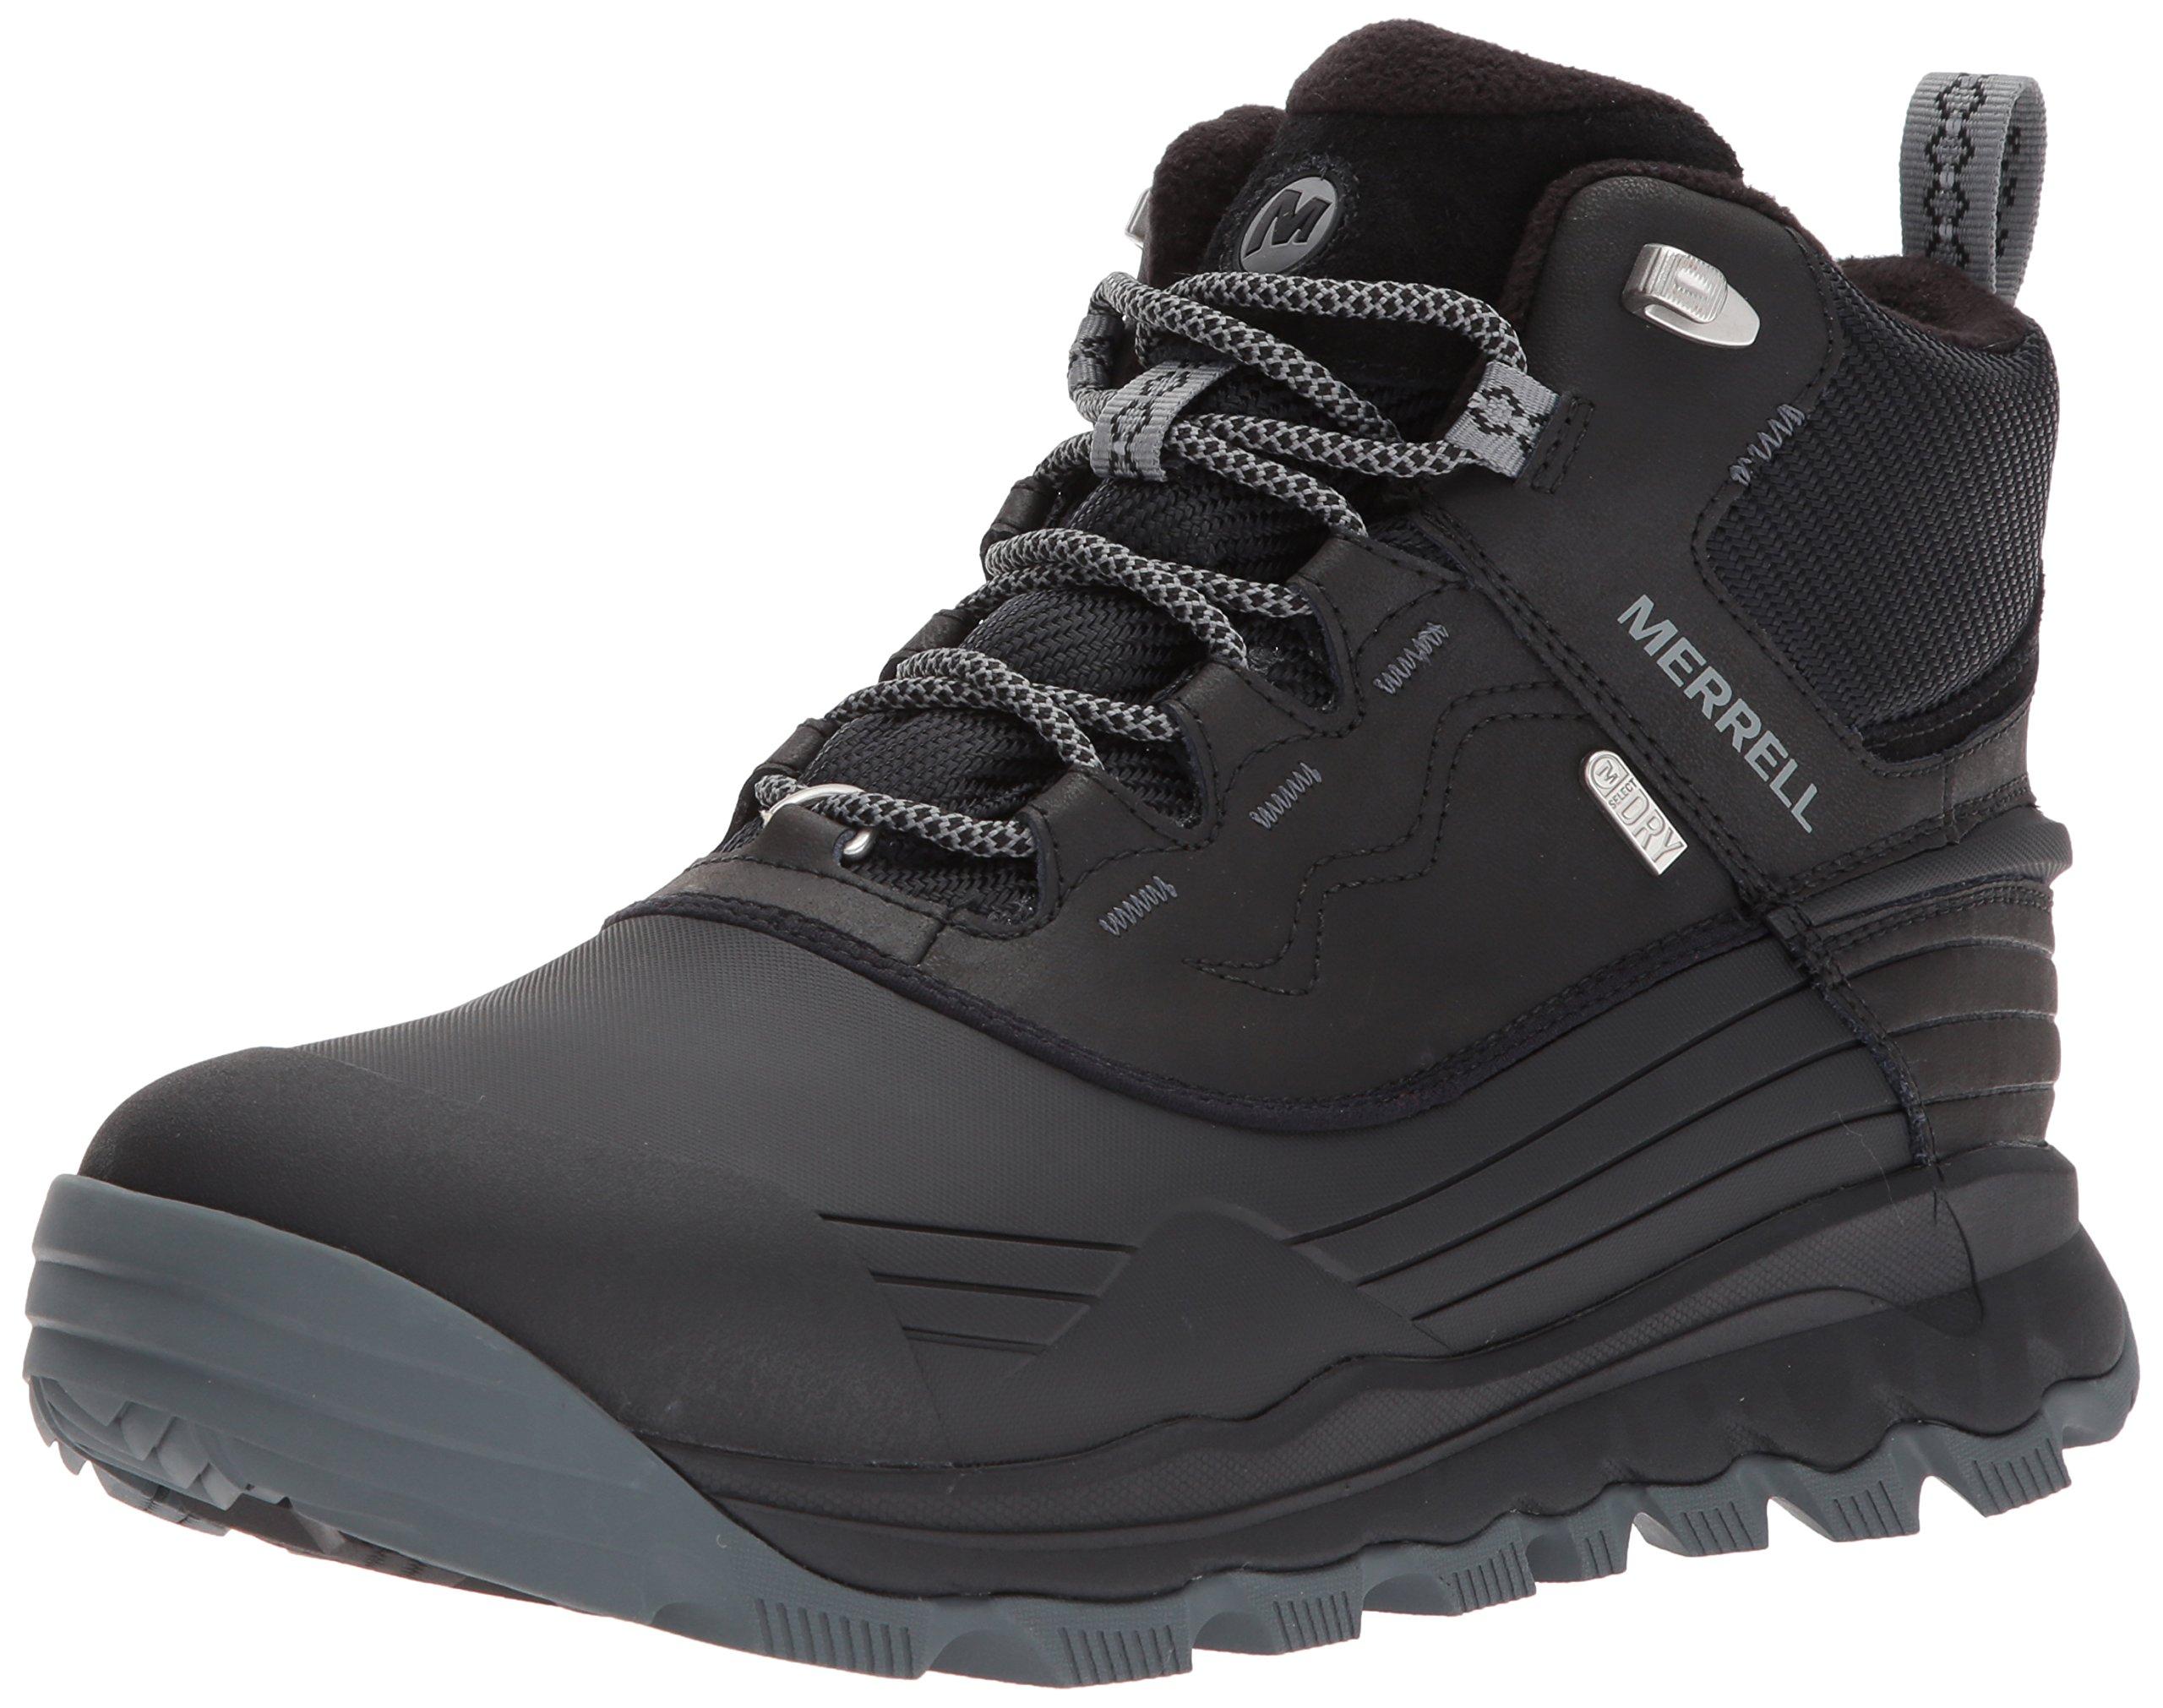 Merrell Men's Thermo Vortex 6'' Waterproof Snow Boot, Black, 12 M US